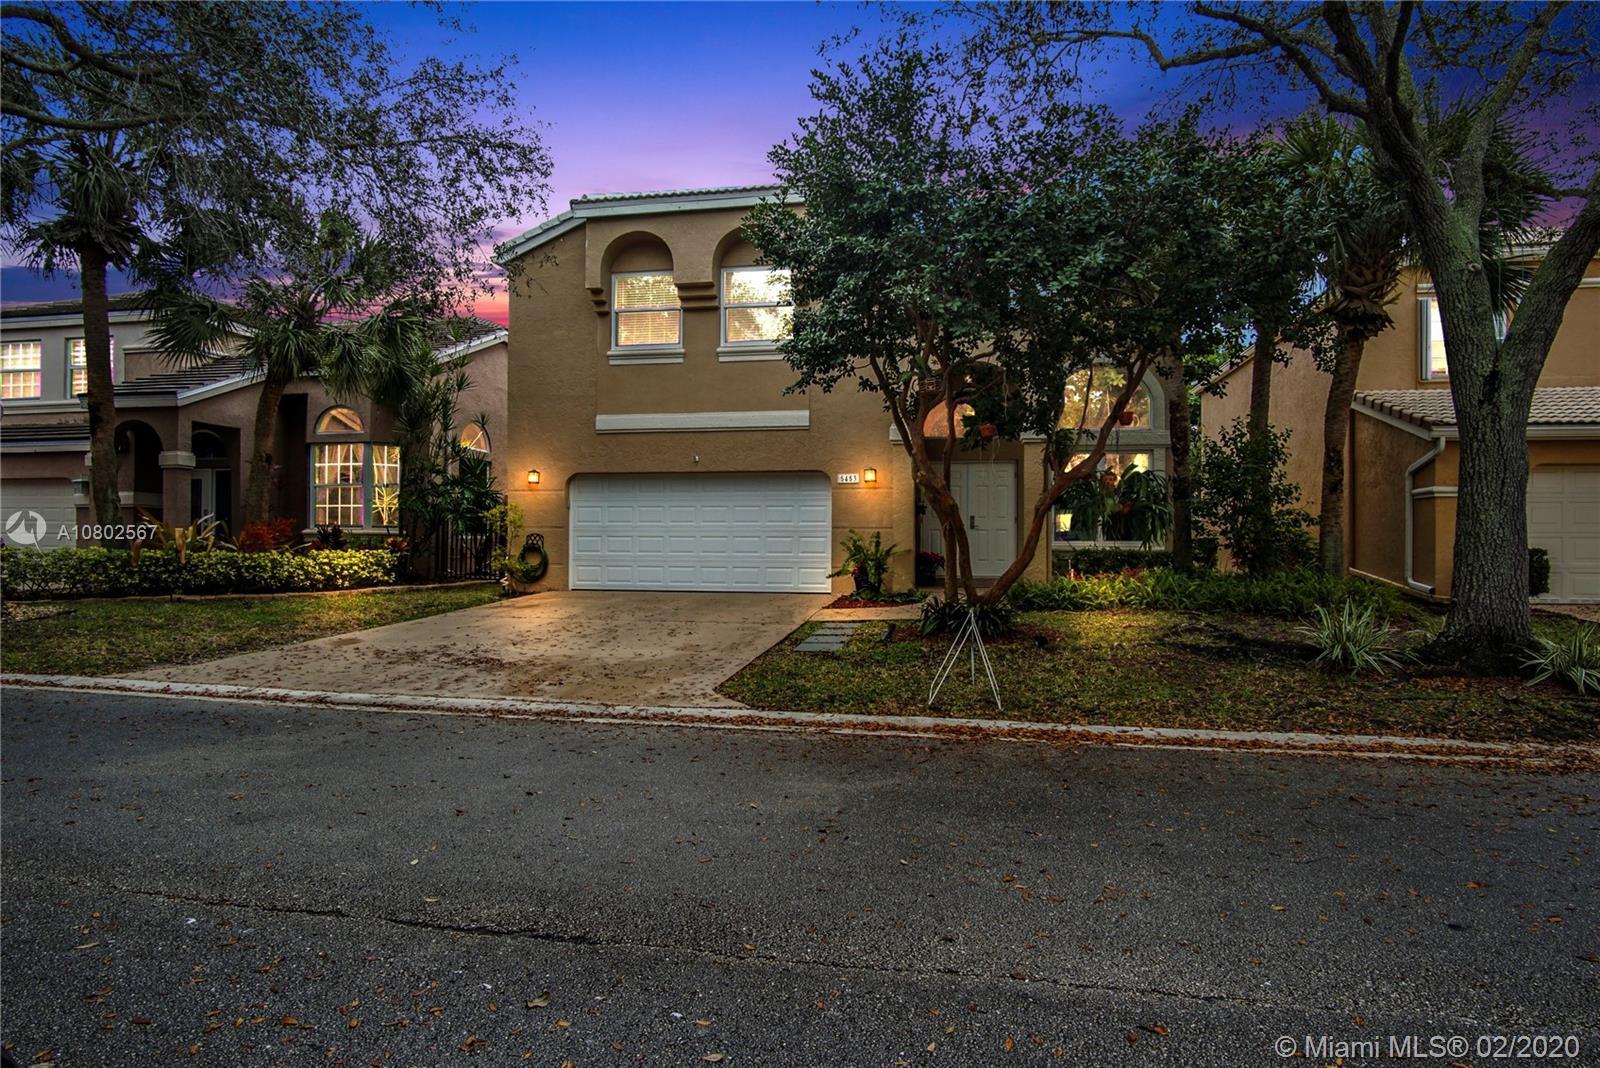 5453 NW 106 Dr, Coral Springs, FL 33076 - Coral Springs, FL real estate listing